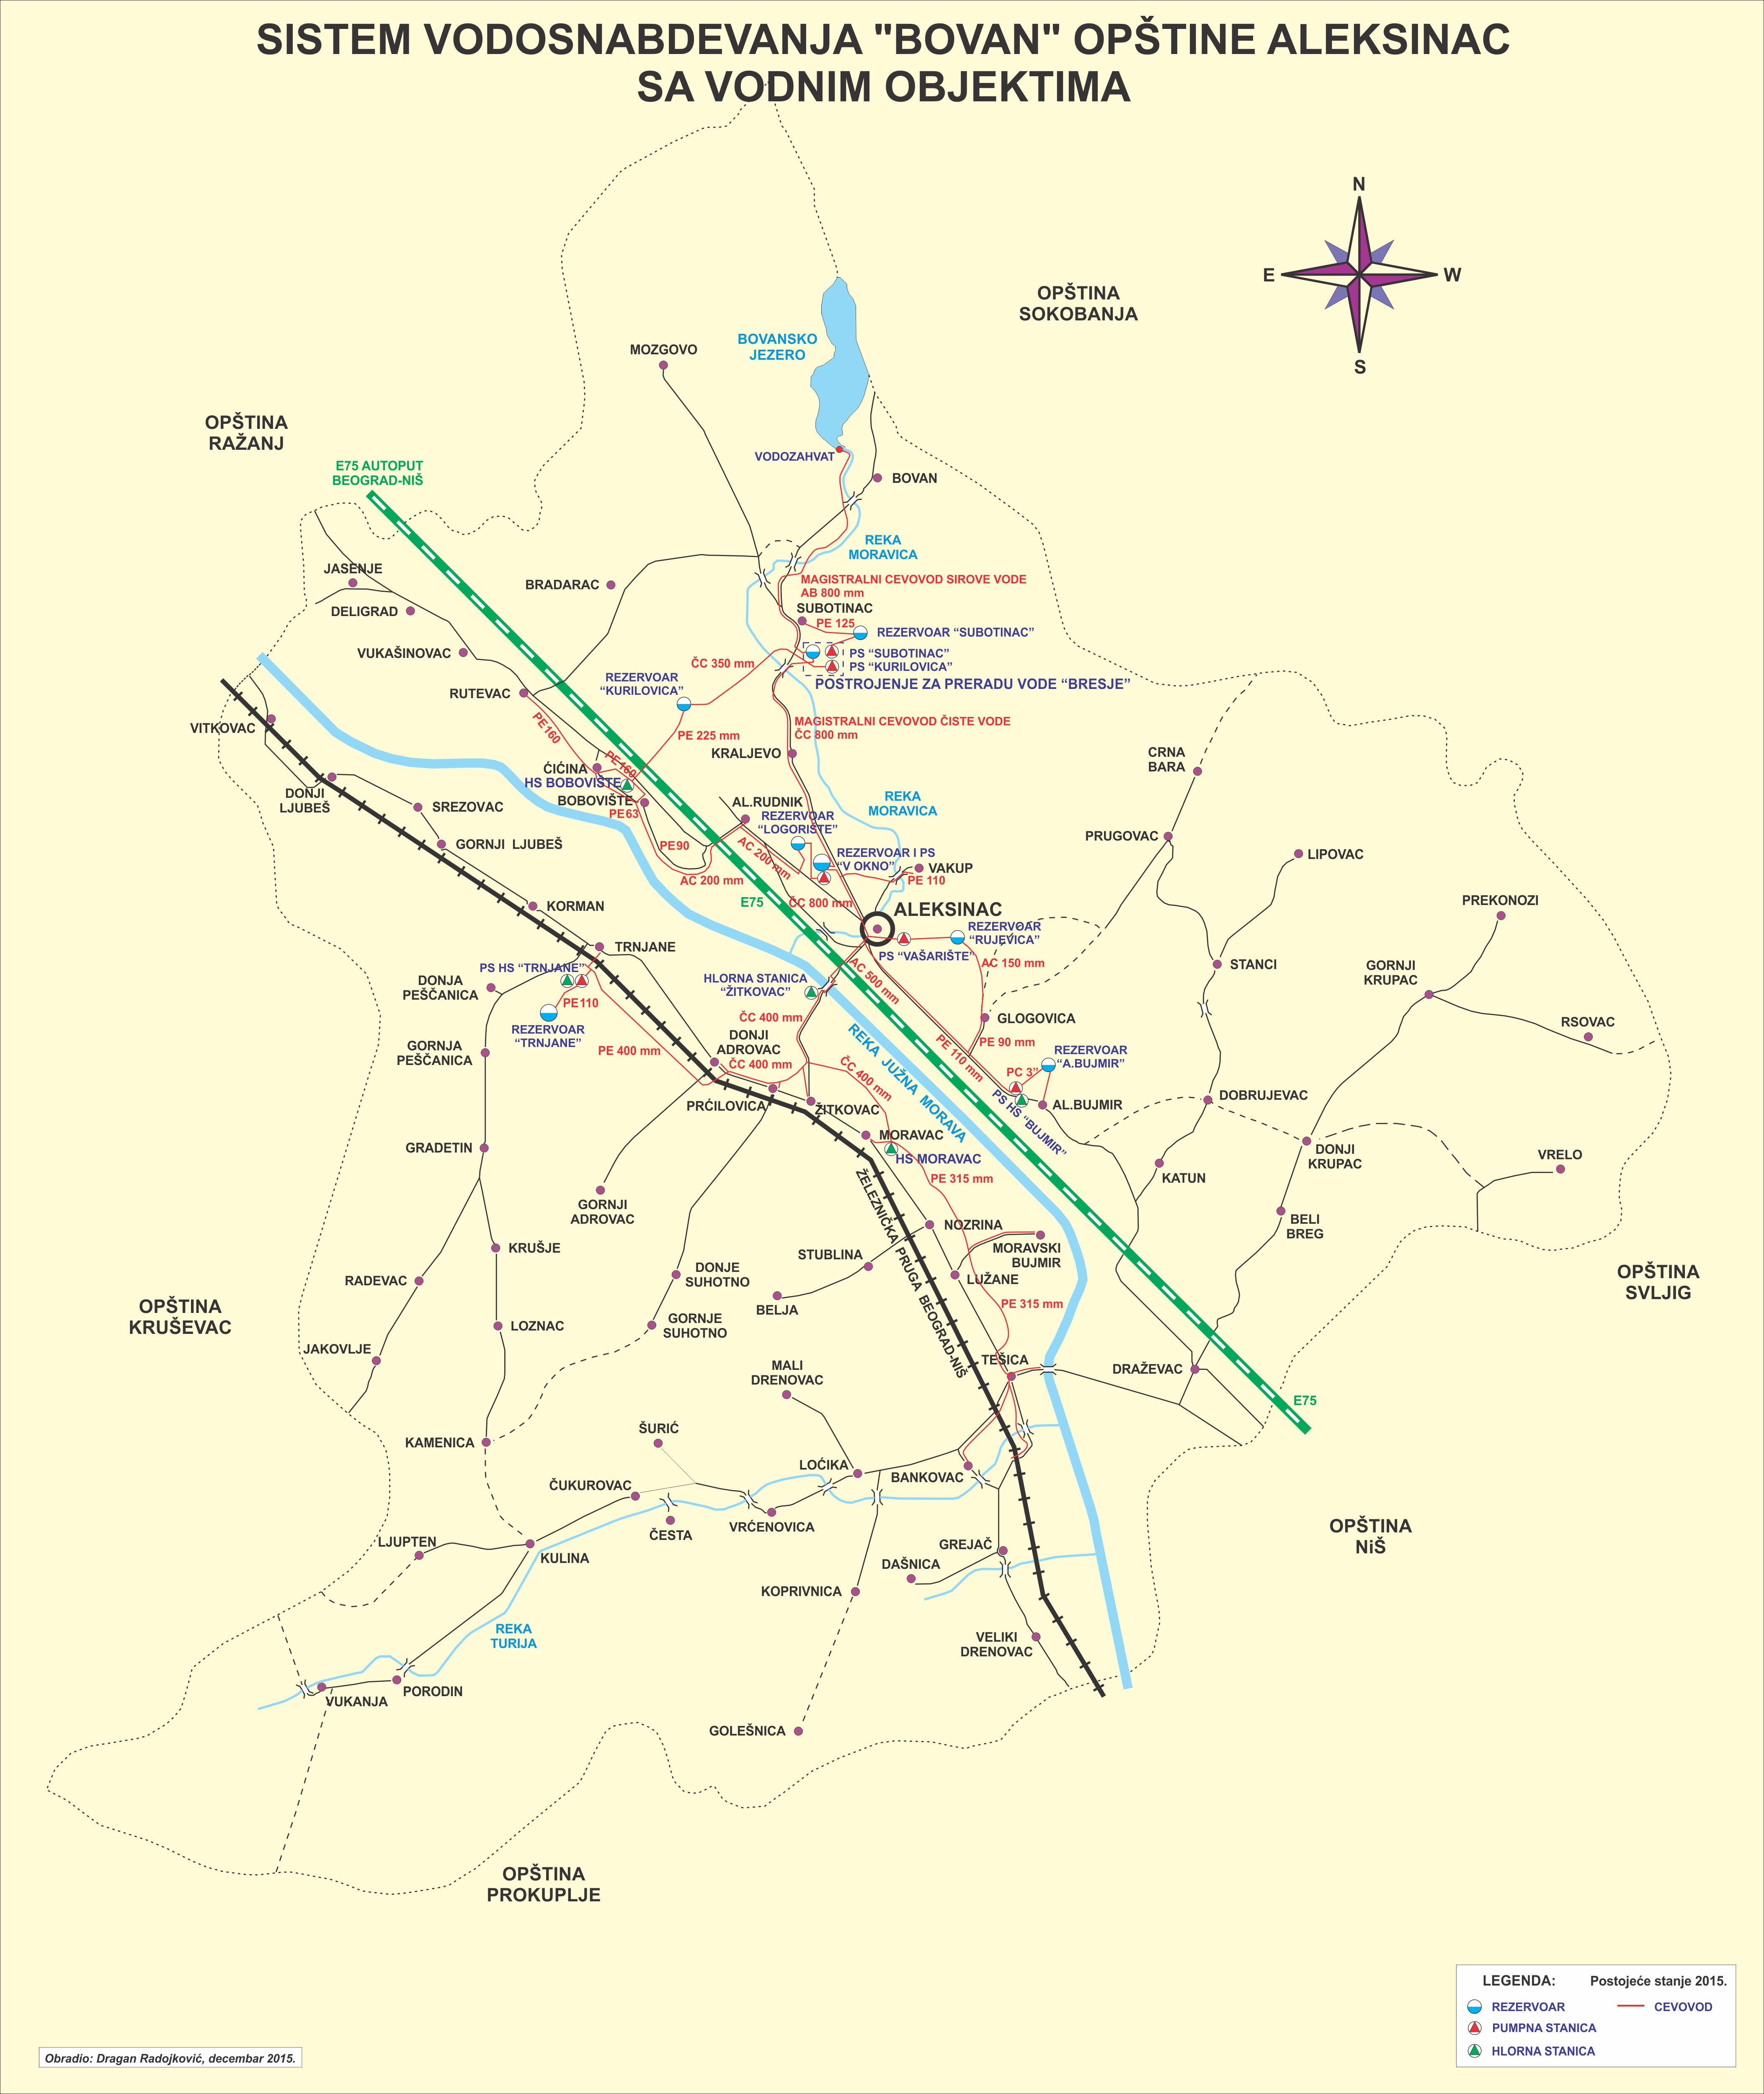 Mapa opstine vodosistem Bovan sa objektima cevovodima 2015